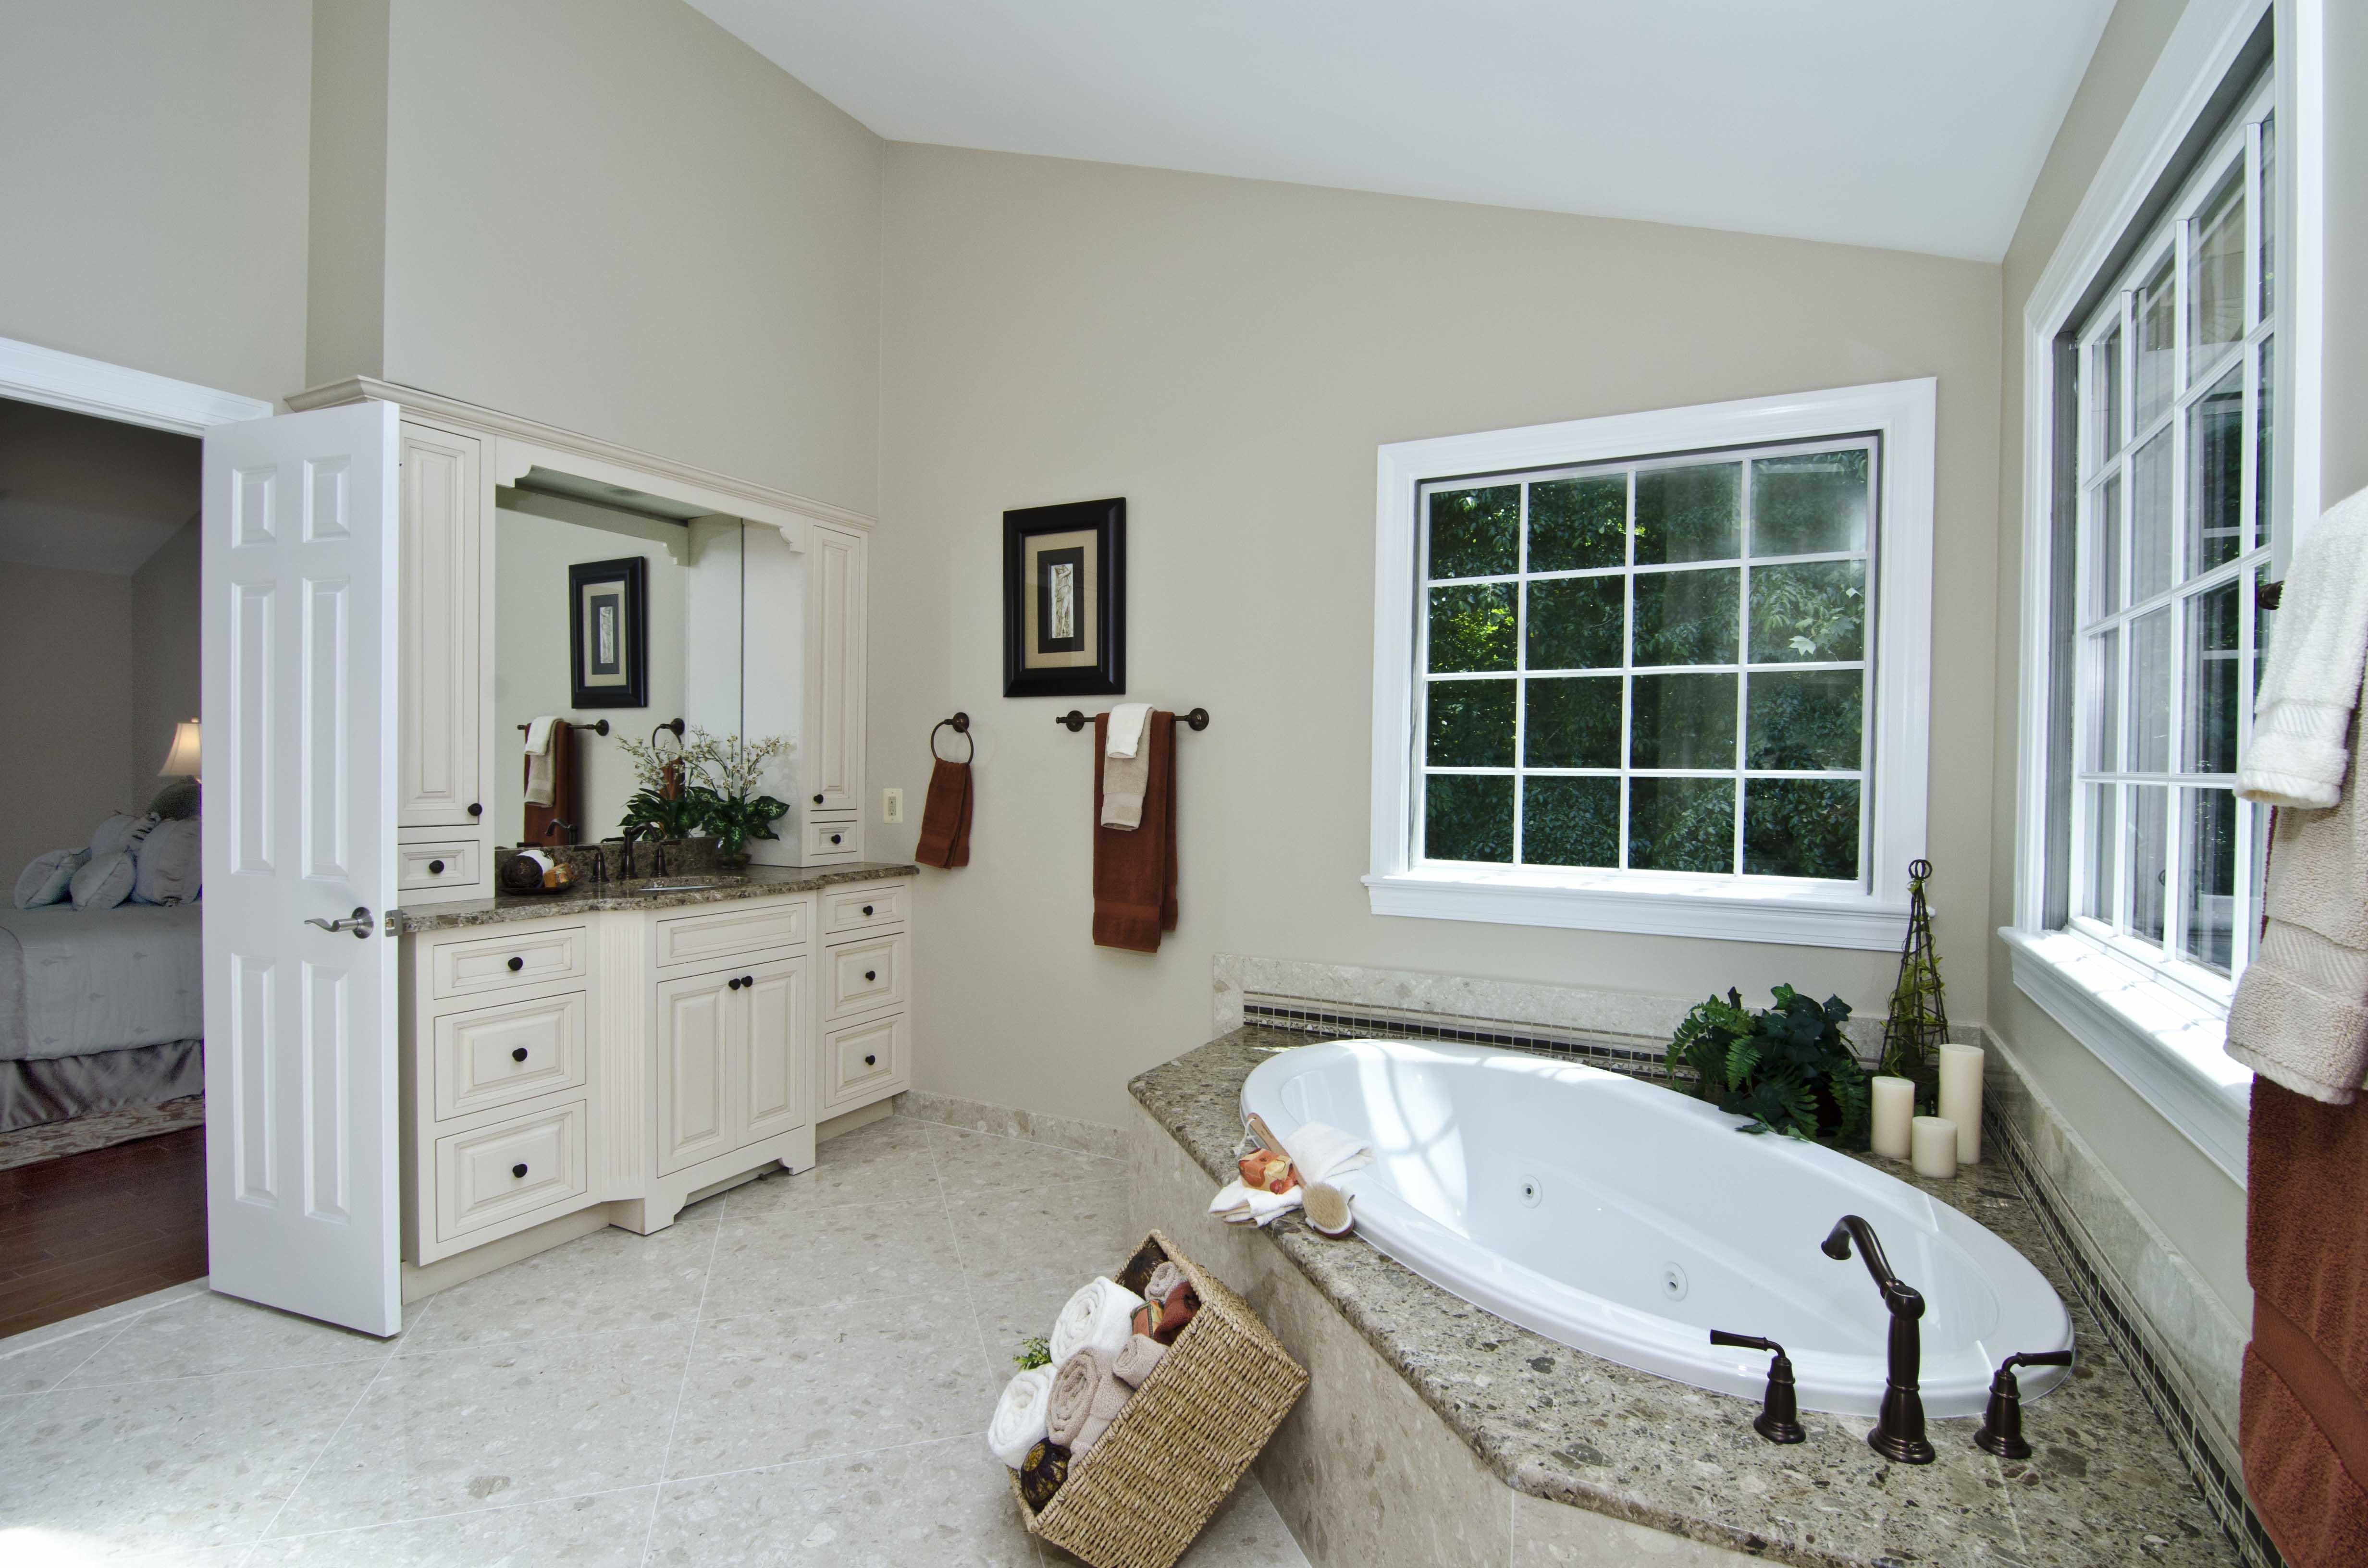 Verona Showers Tub Deck and Marble Floors